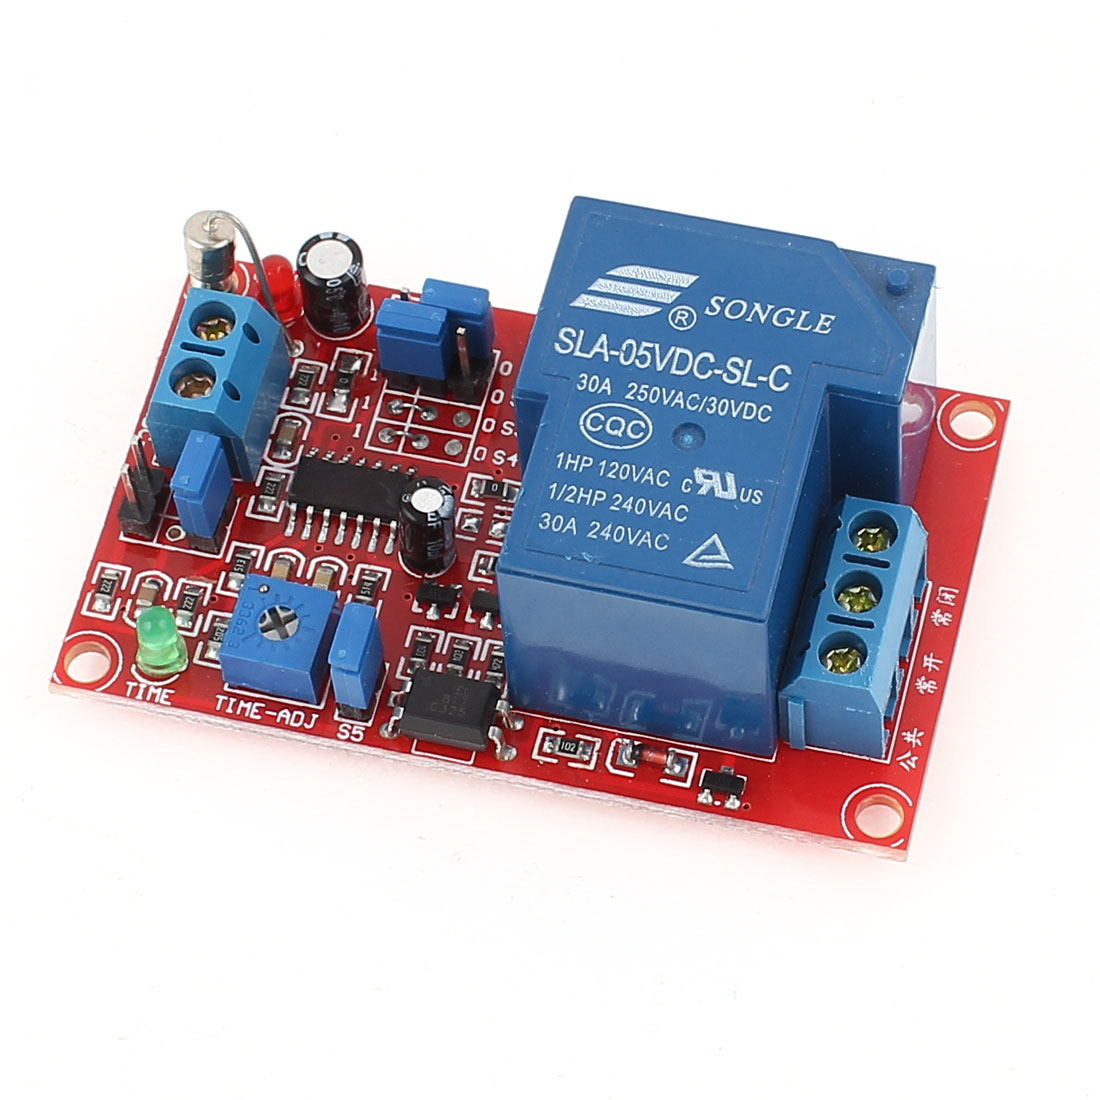 SLA-05VDC-SL-C 1 Channel High/Low Level Adjustable Delay Time Relay Module DC5V 30A